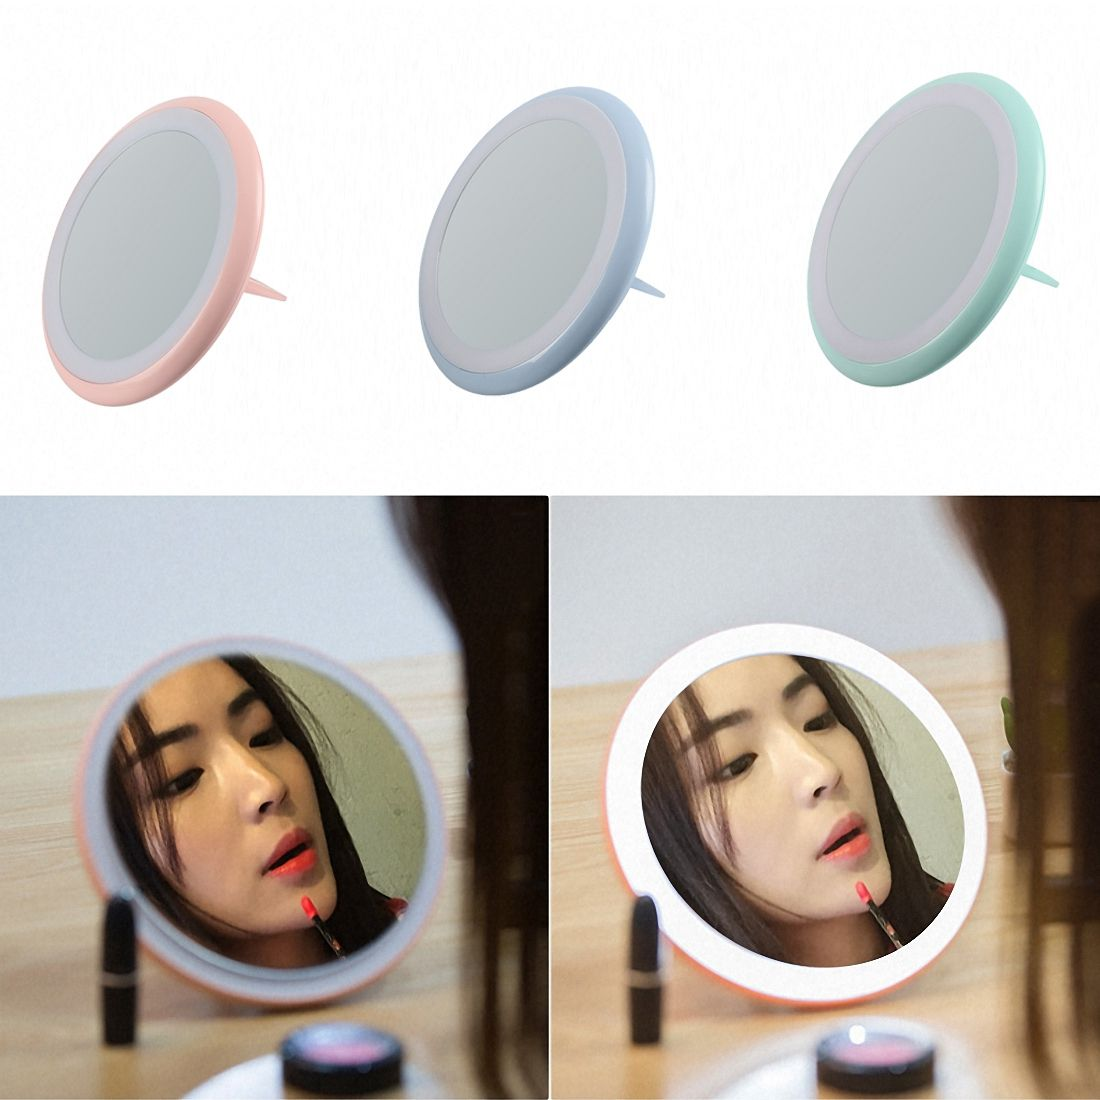 Portable Lighted Makeup Mirror Vanity Led Light Kit Usb Charging Cosmetic Lighted Make Up Mirrors Bulb Brightness Vanity Lights Elegant Shape Lights & Lighting